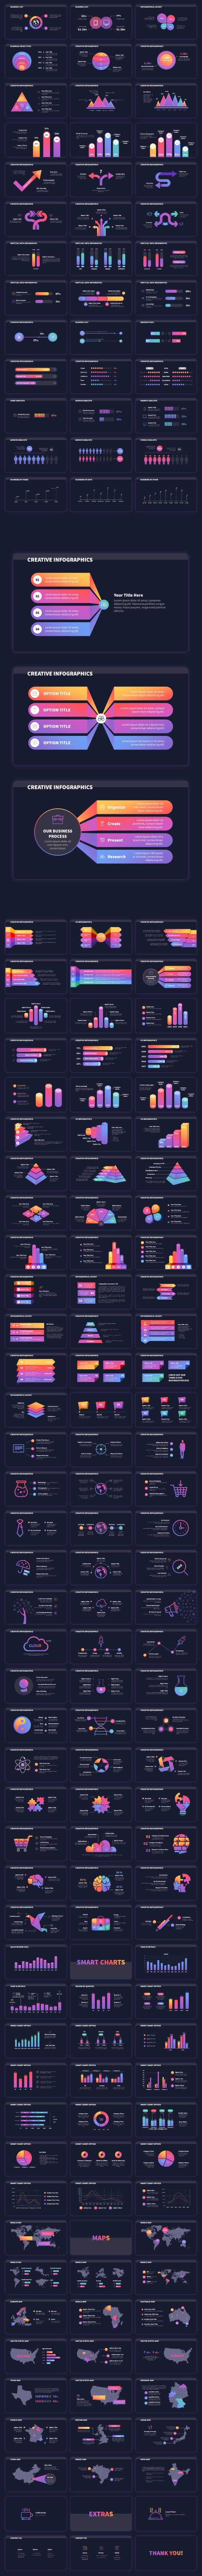 VIVID 2021 - Professional PowerPoint Presentation Template - 21